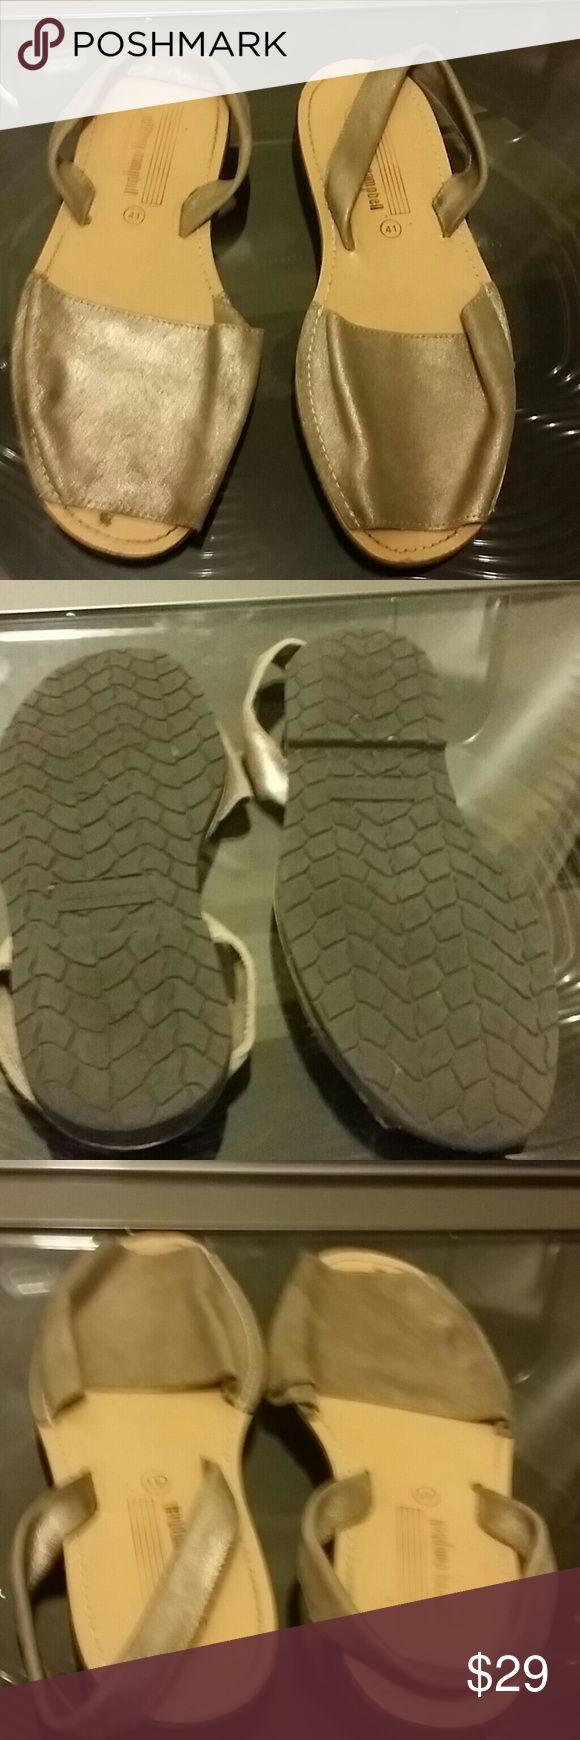 Jeffrey campbell sandals Jeffrey campbell leather sandals size 41 made in Spain jeffrey campbell  Shoes Sandals